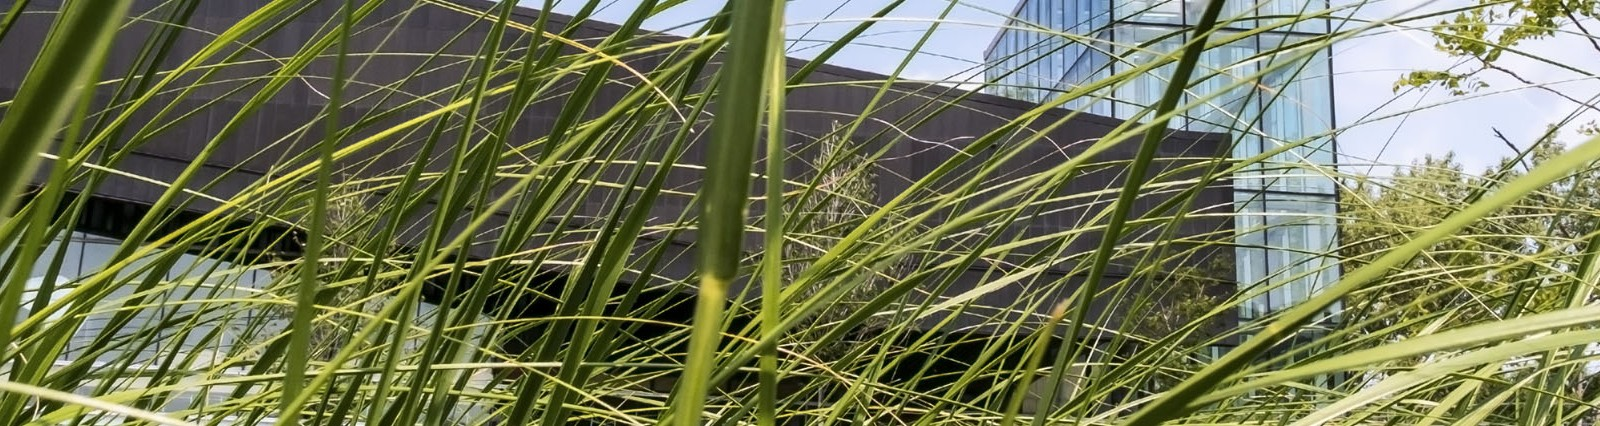 Placi acrilice compozite fabricate sustenabil